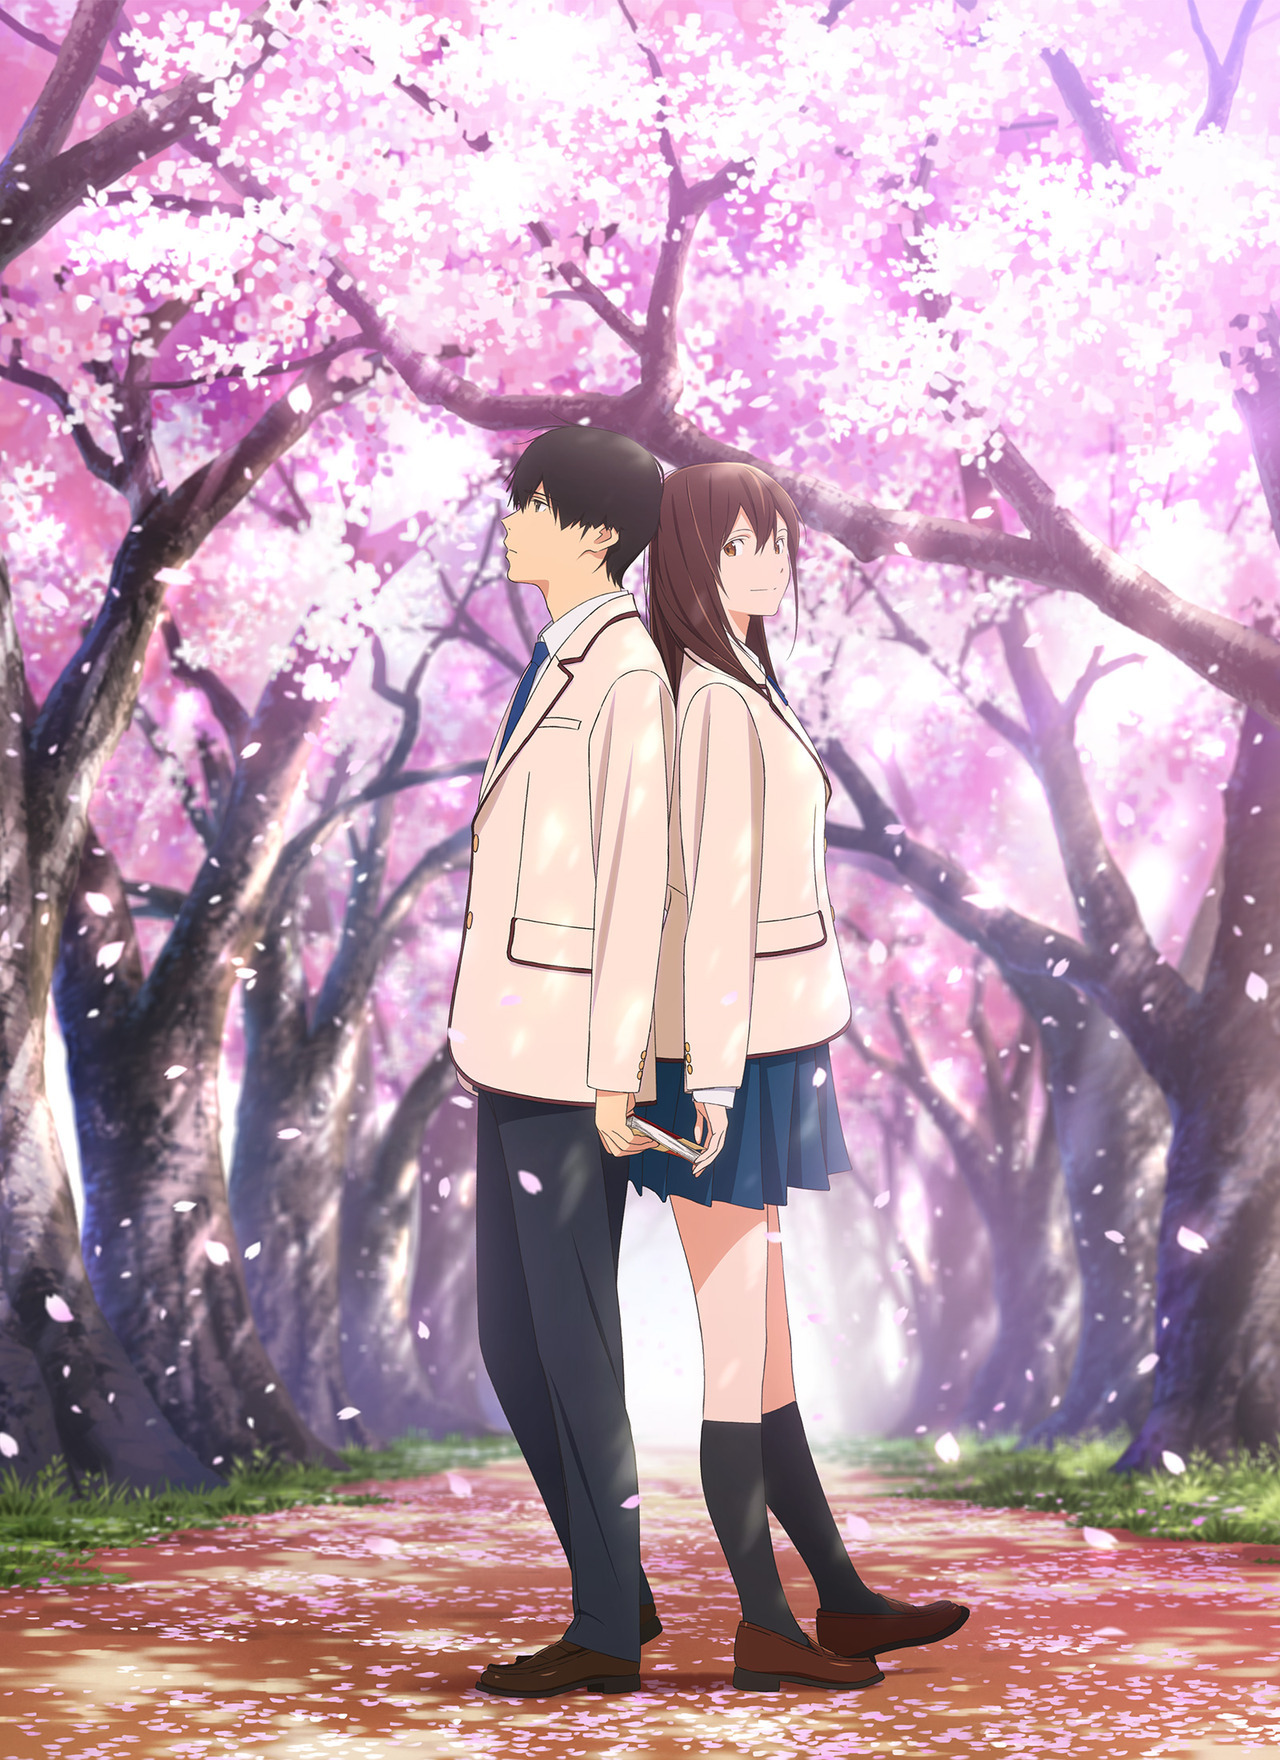 https://www.animeclick.it/immagini/anime/Kimi_no_Suizou_o_Tabetai/cover/Kimi_no_Suizou_o_Tabetai-cover.jpg